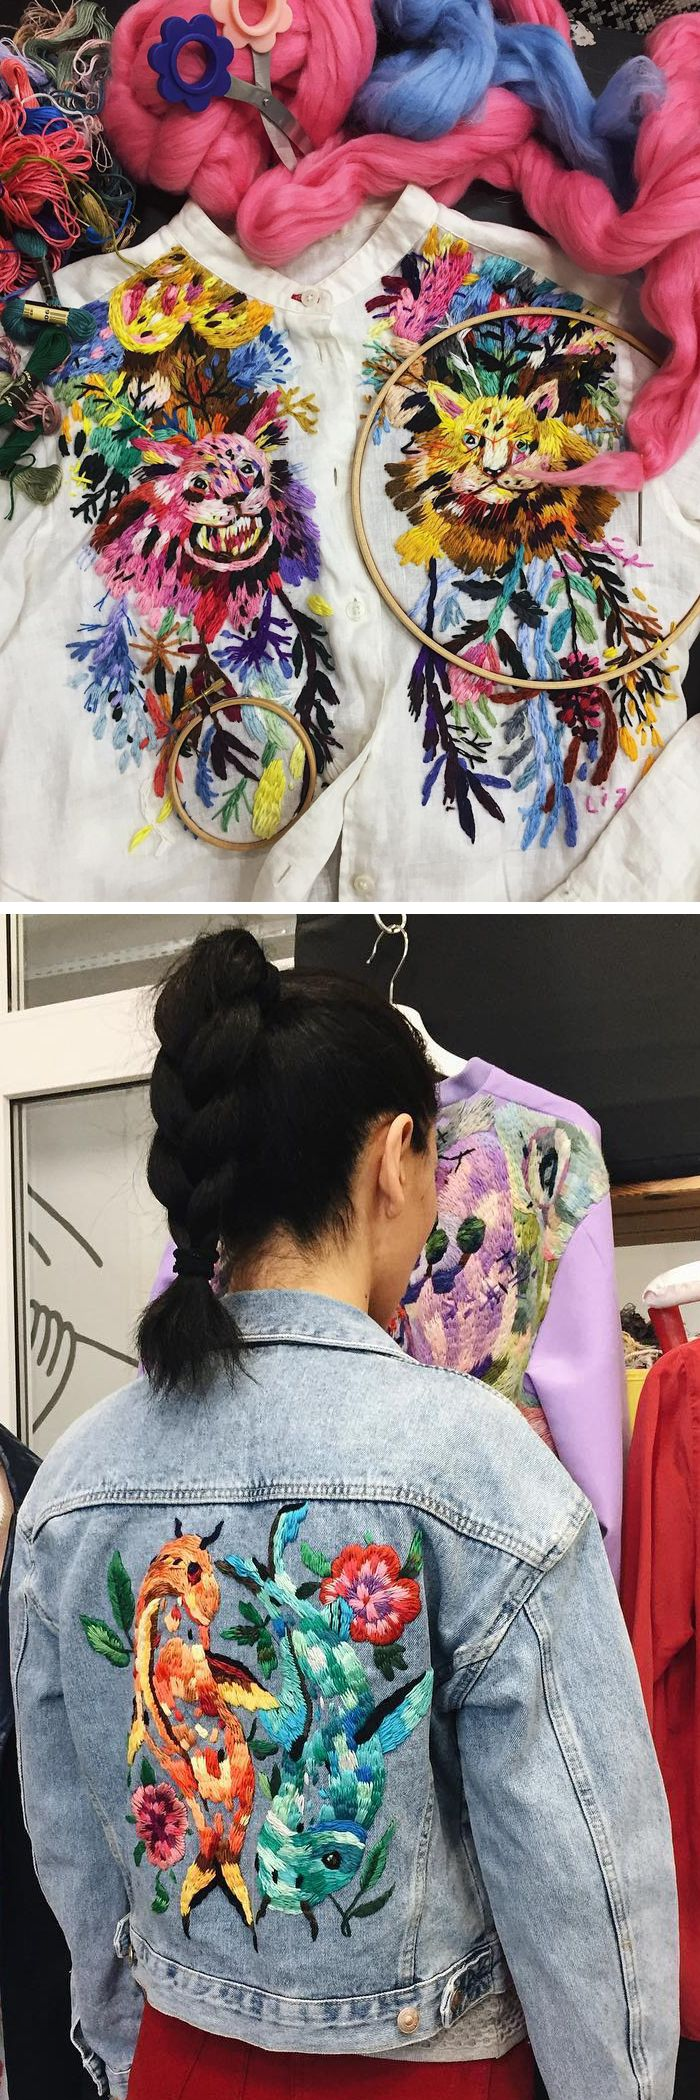 Custom embroidered clothing by Lisa Smirova